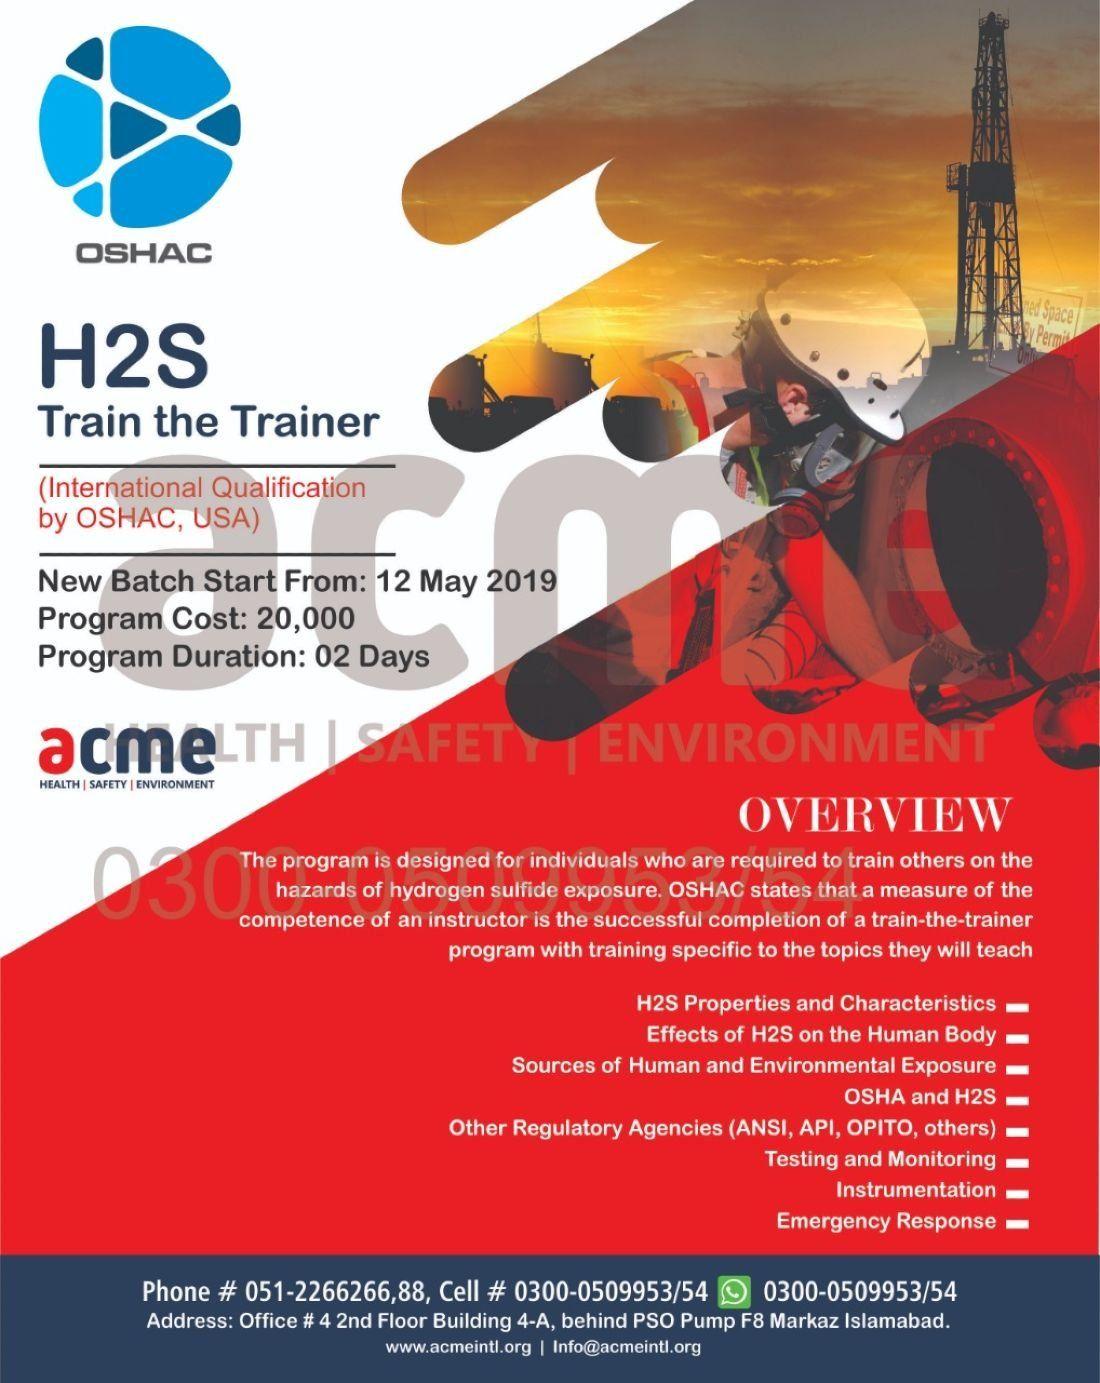 OSAHC H2S Train the trainer